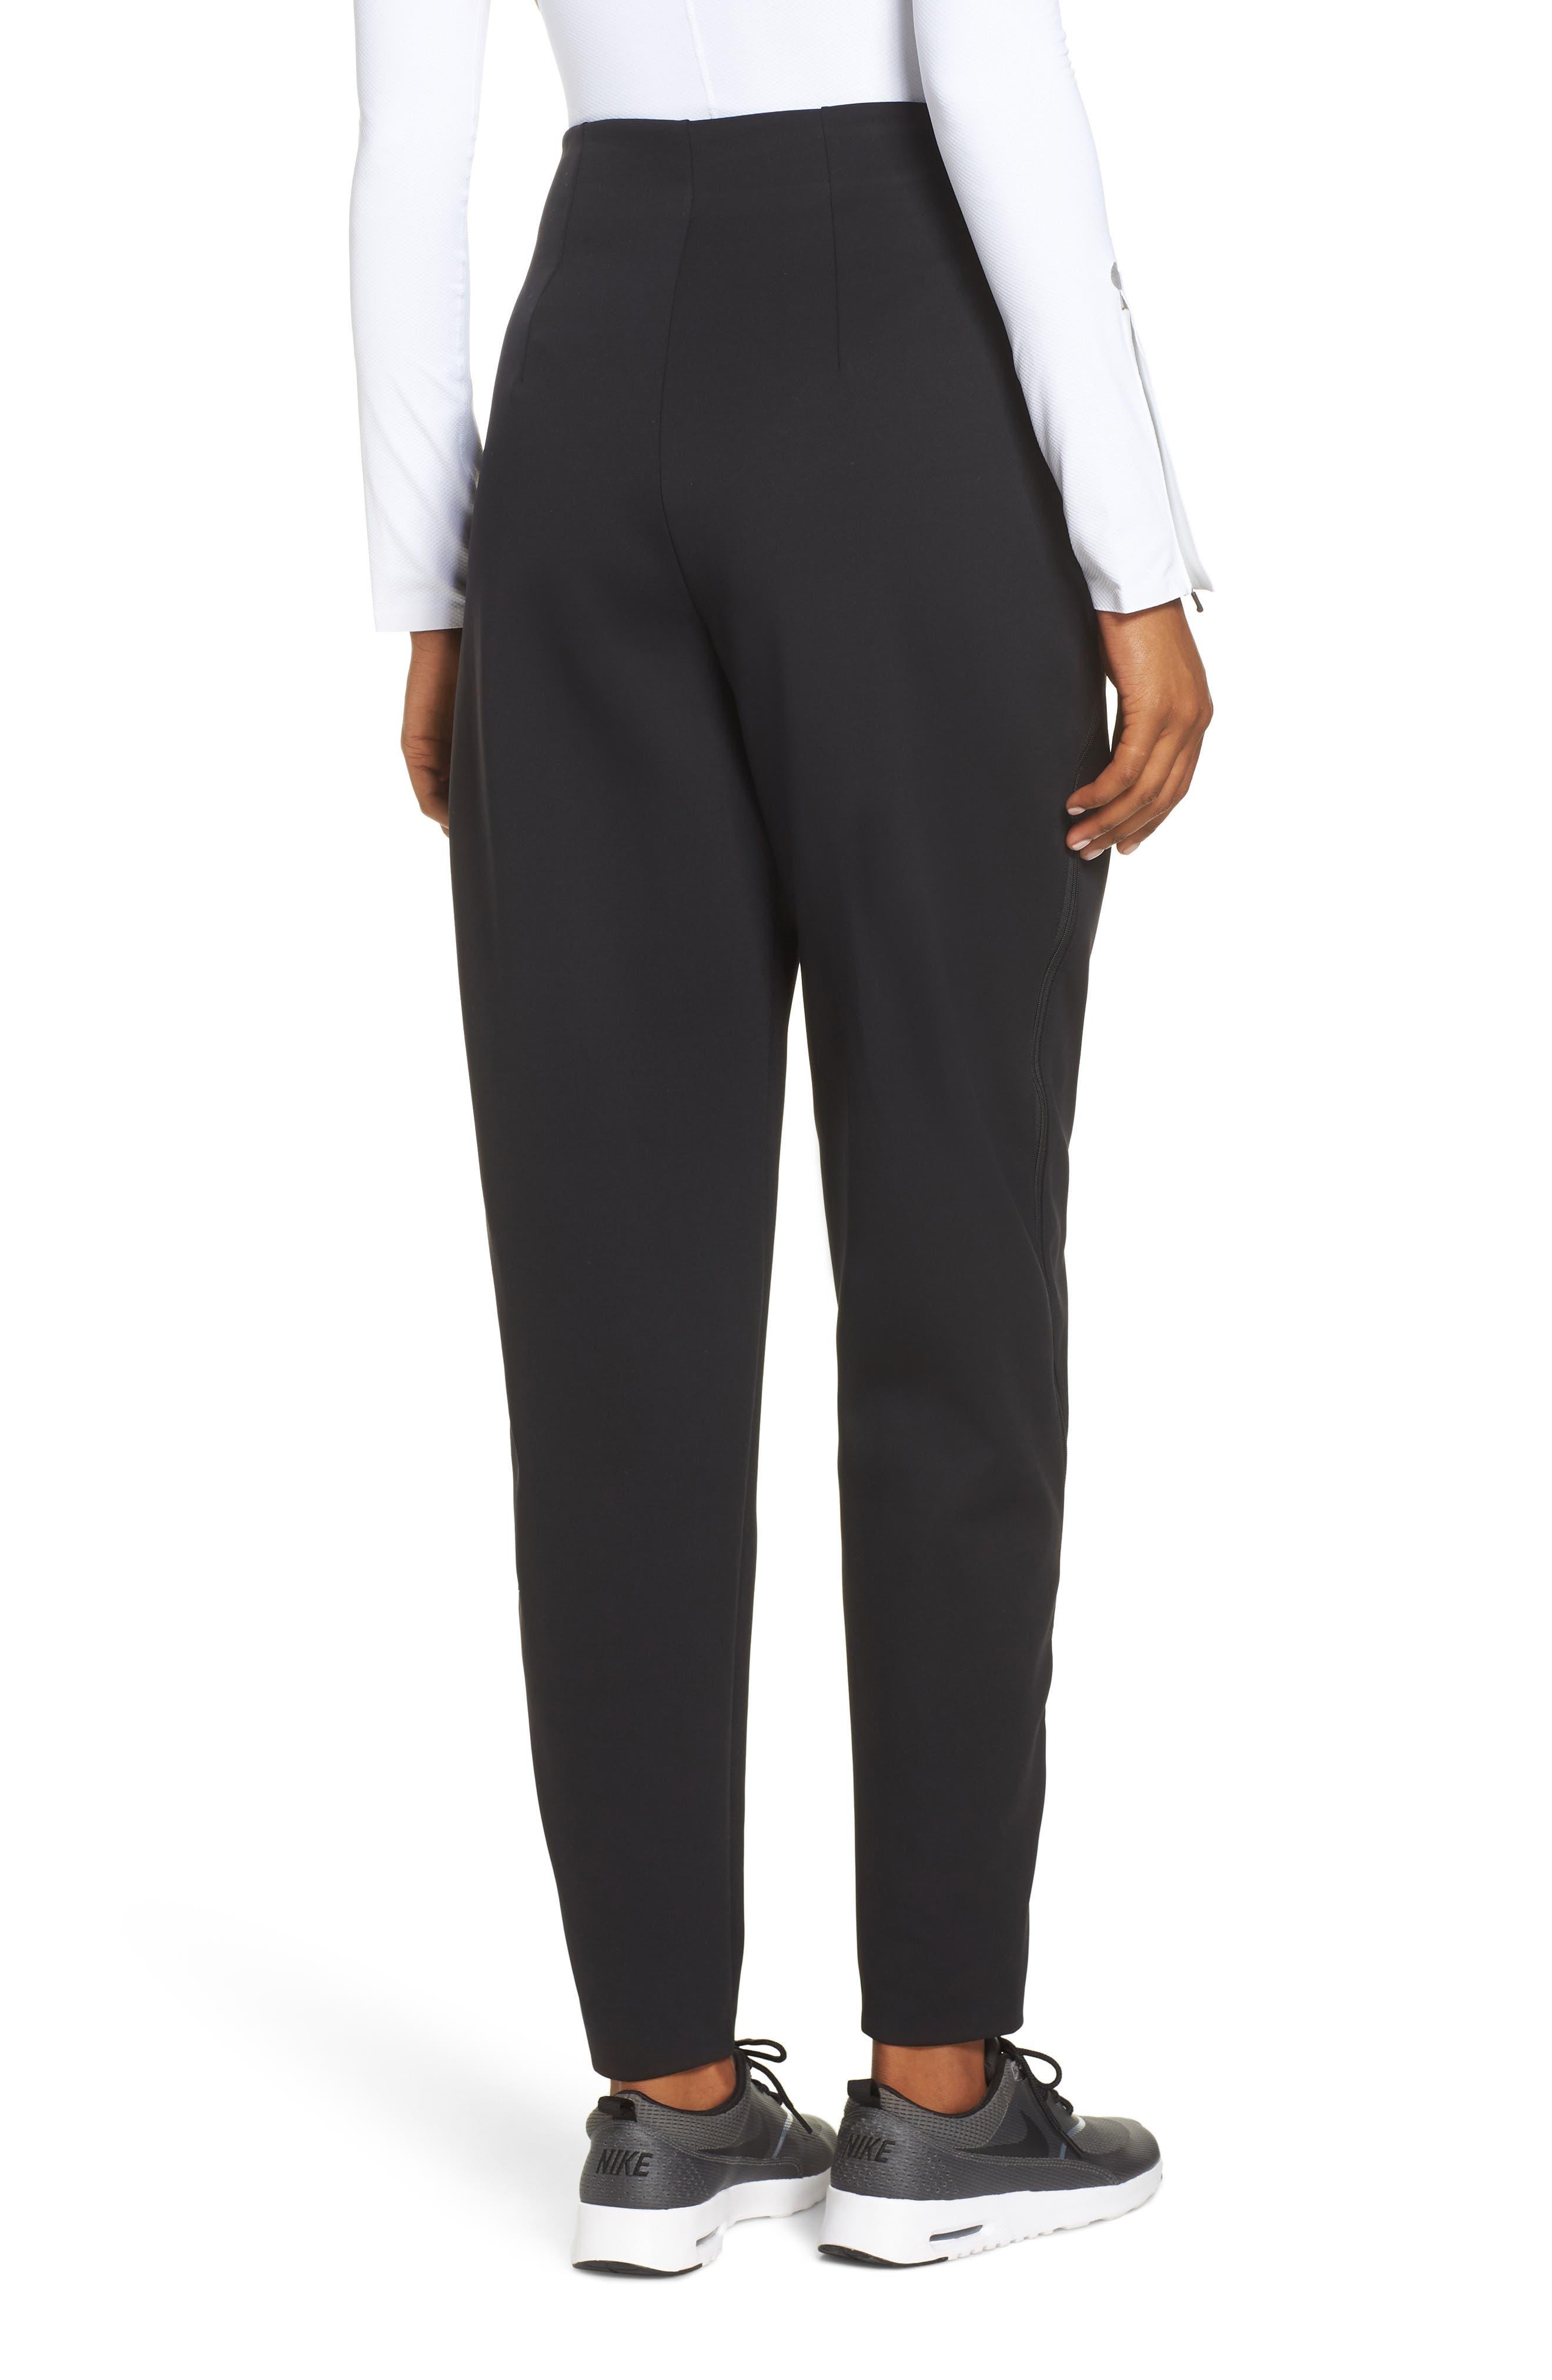 XX Project Women's Dri-FIT Training Pants,                             Alternate thumbnail 2, color,                             BLACK